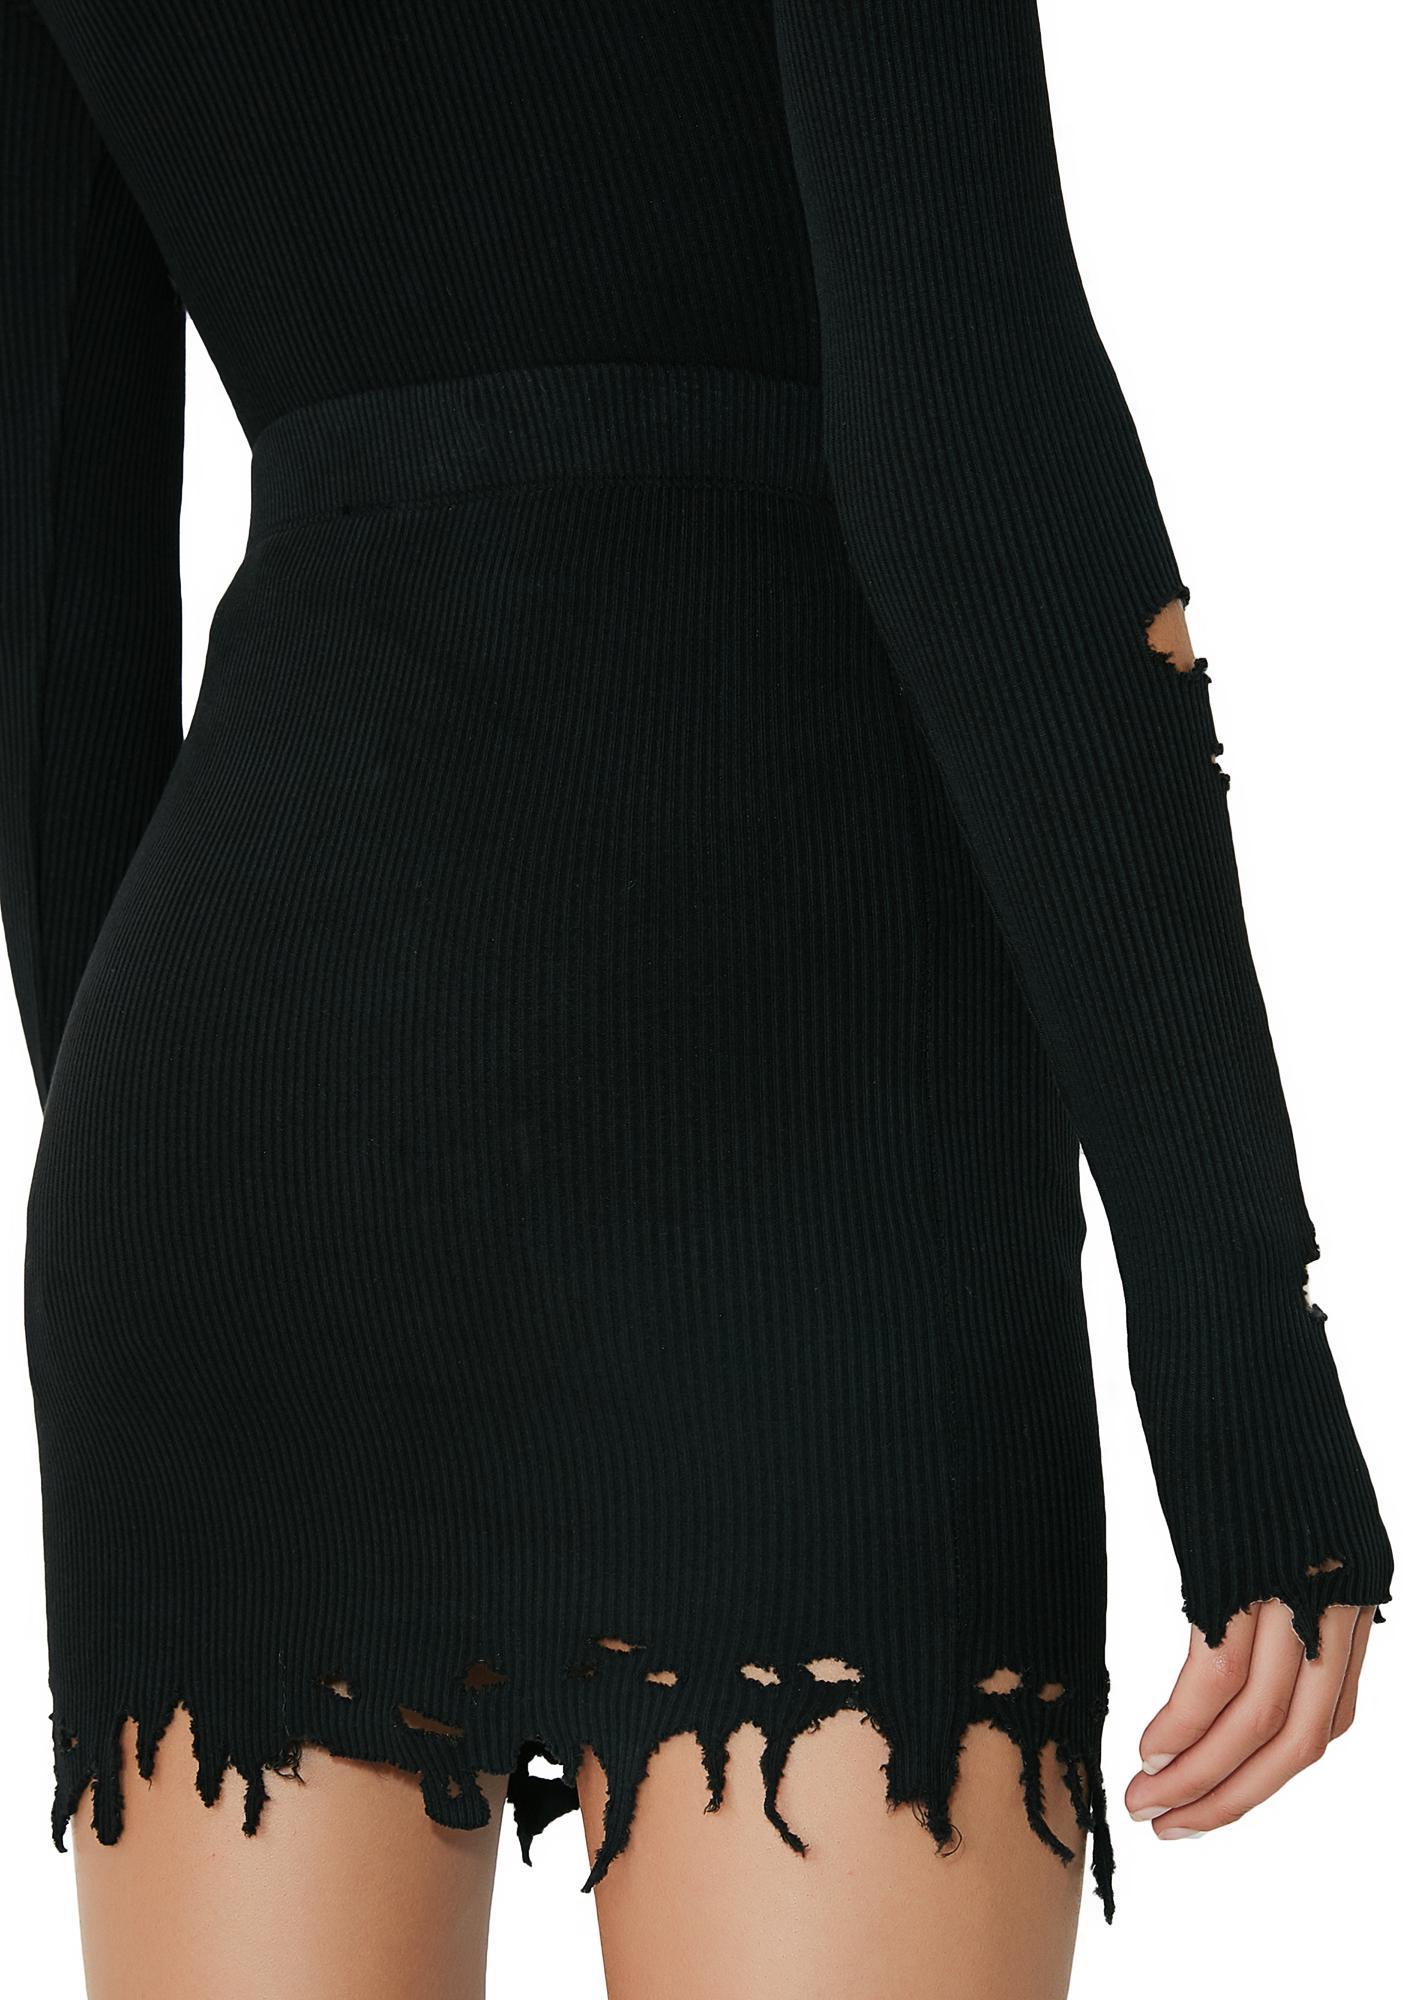 Kiki Riki Down To Ride Sweater Set